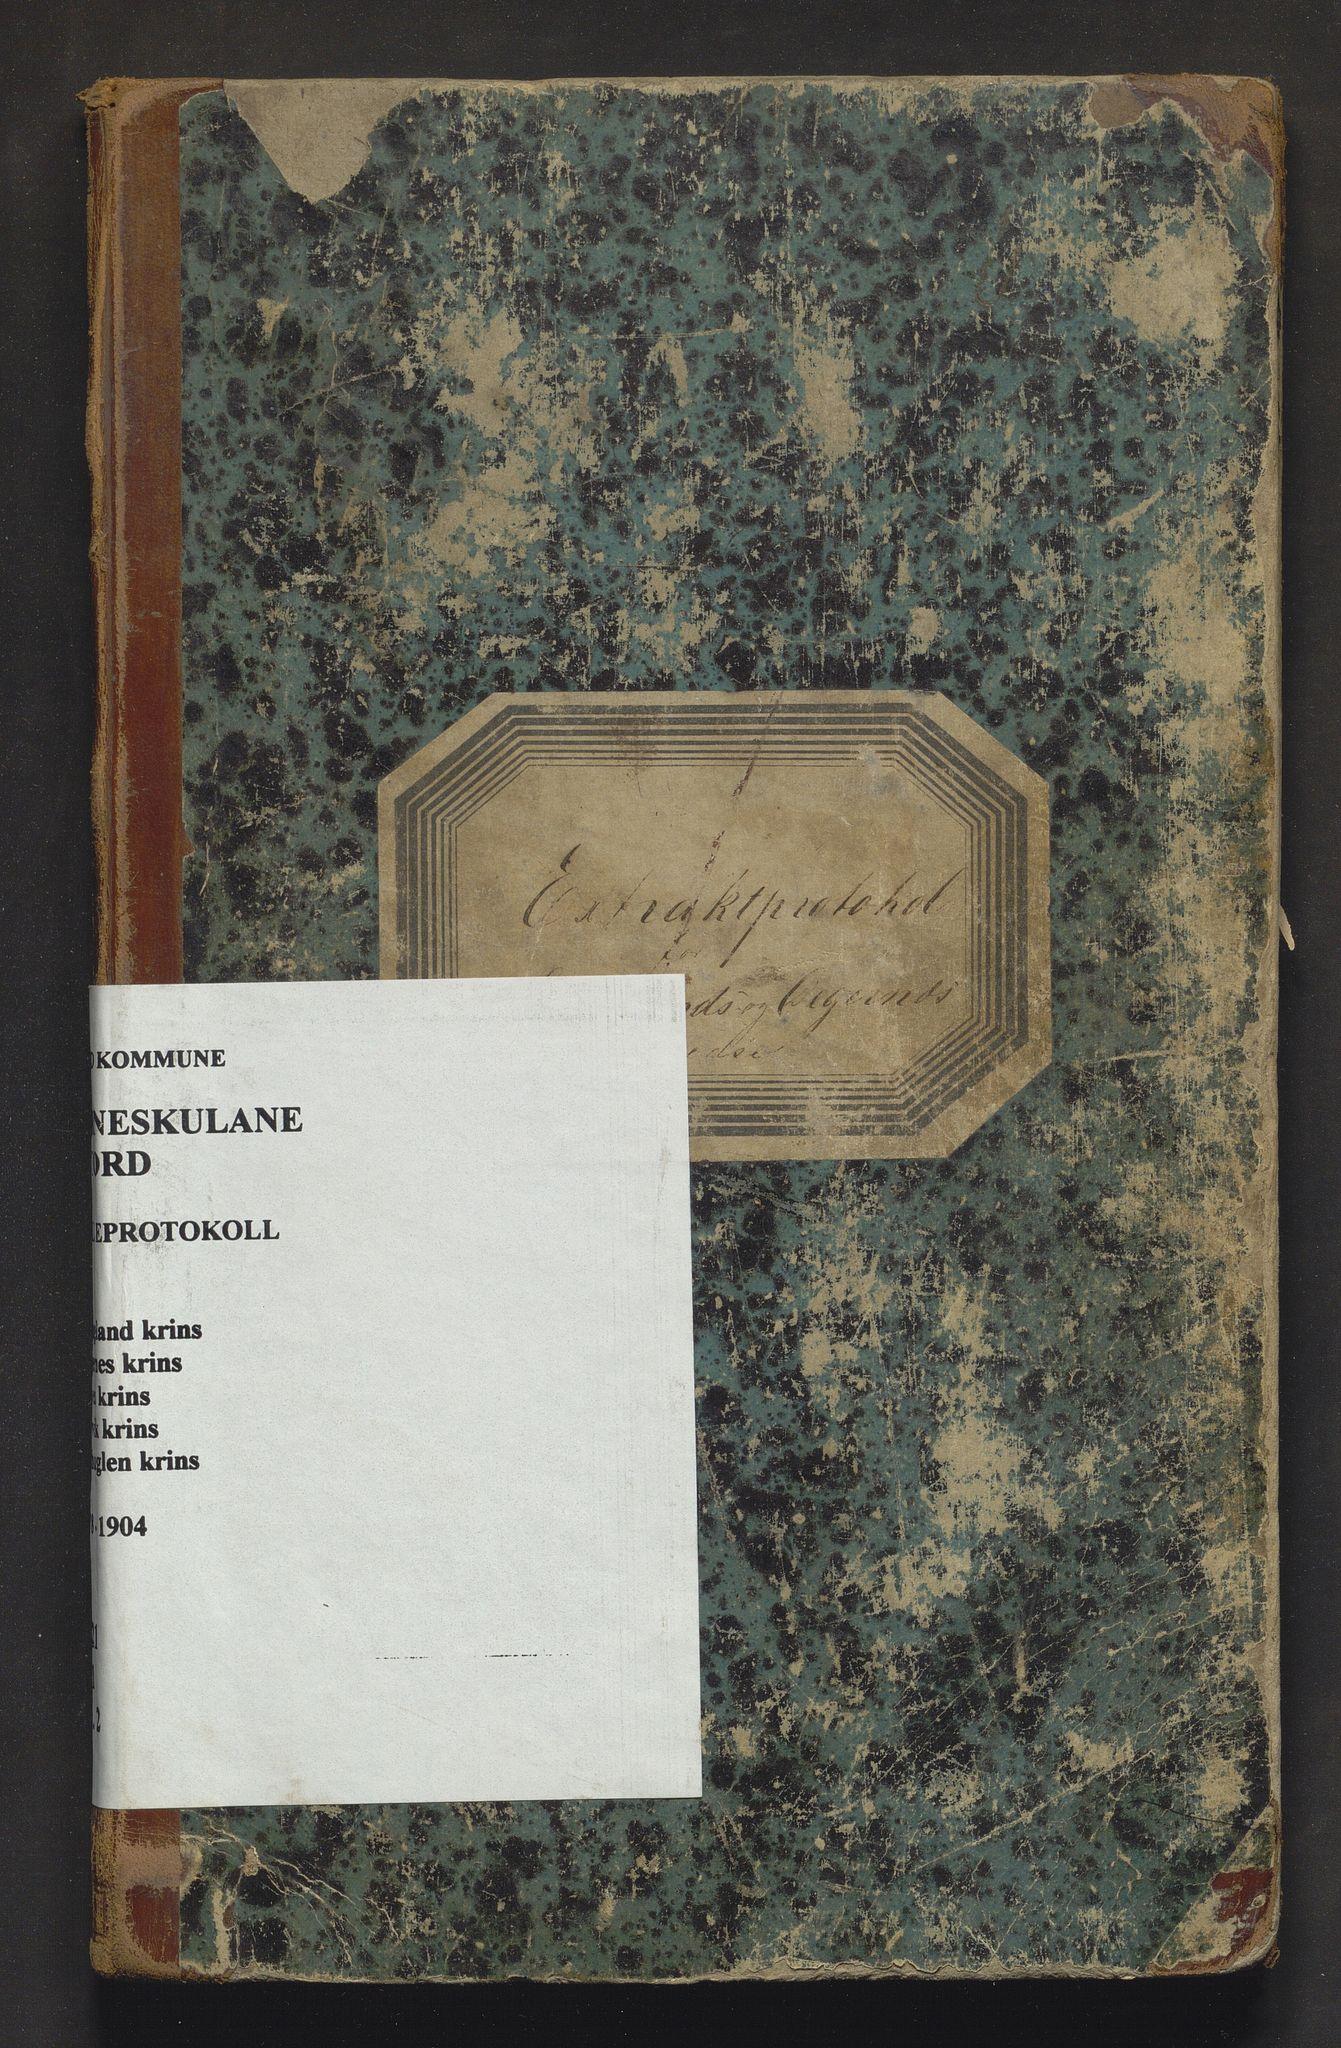 IKAH, Stord kommune. Barneskulane, F/Fa/L0002: Skuleprotokoll for Langeland, Digernes, Føyen, Lervik og Sørhuglen krinsar, 1878-1904